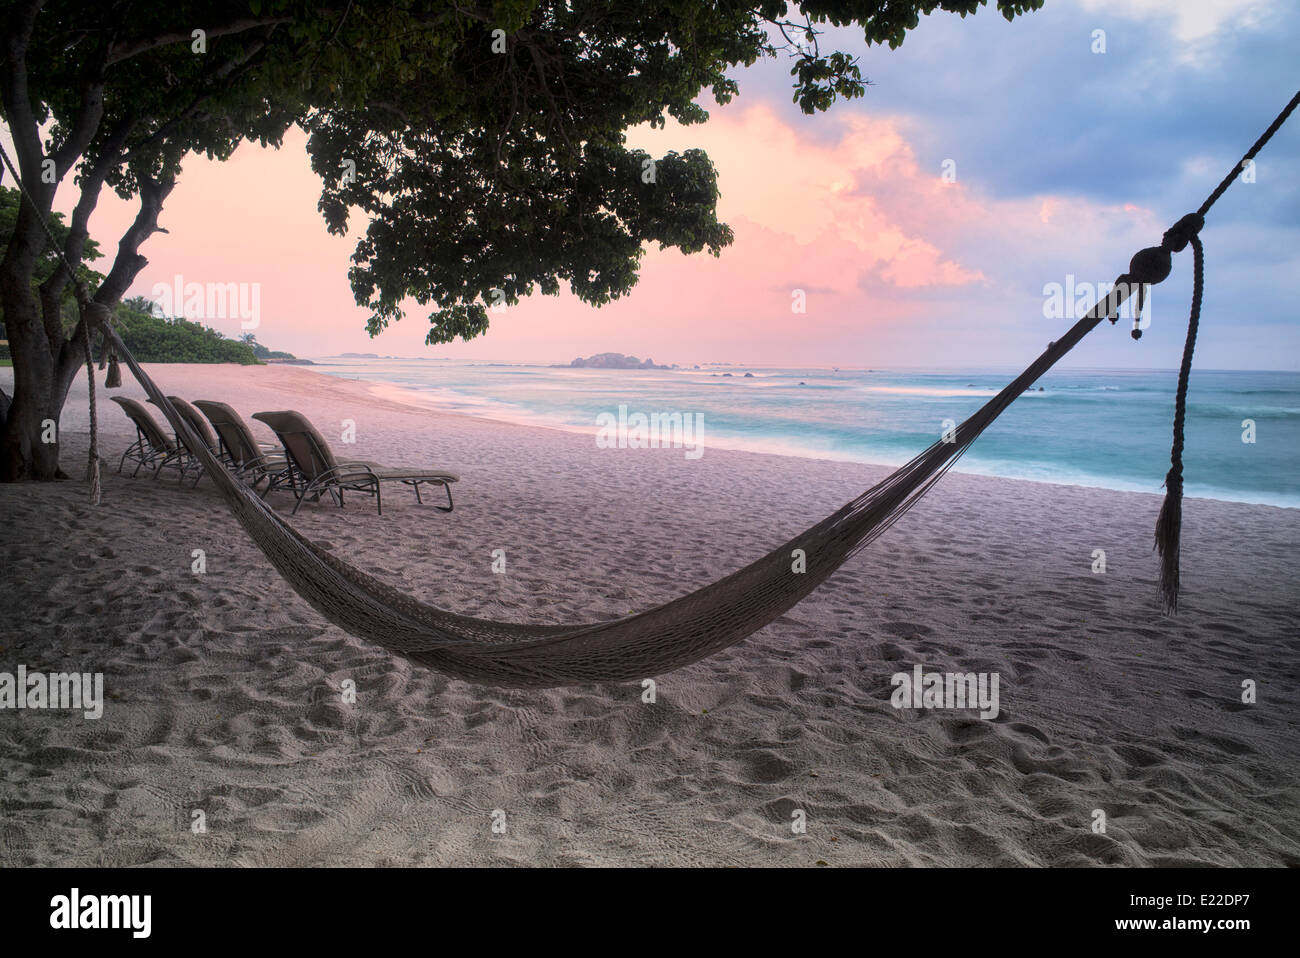 Sunset on beach with hammock at Punta Mita, Mexico. - Stock Image